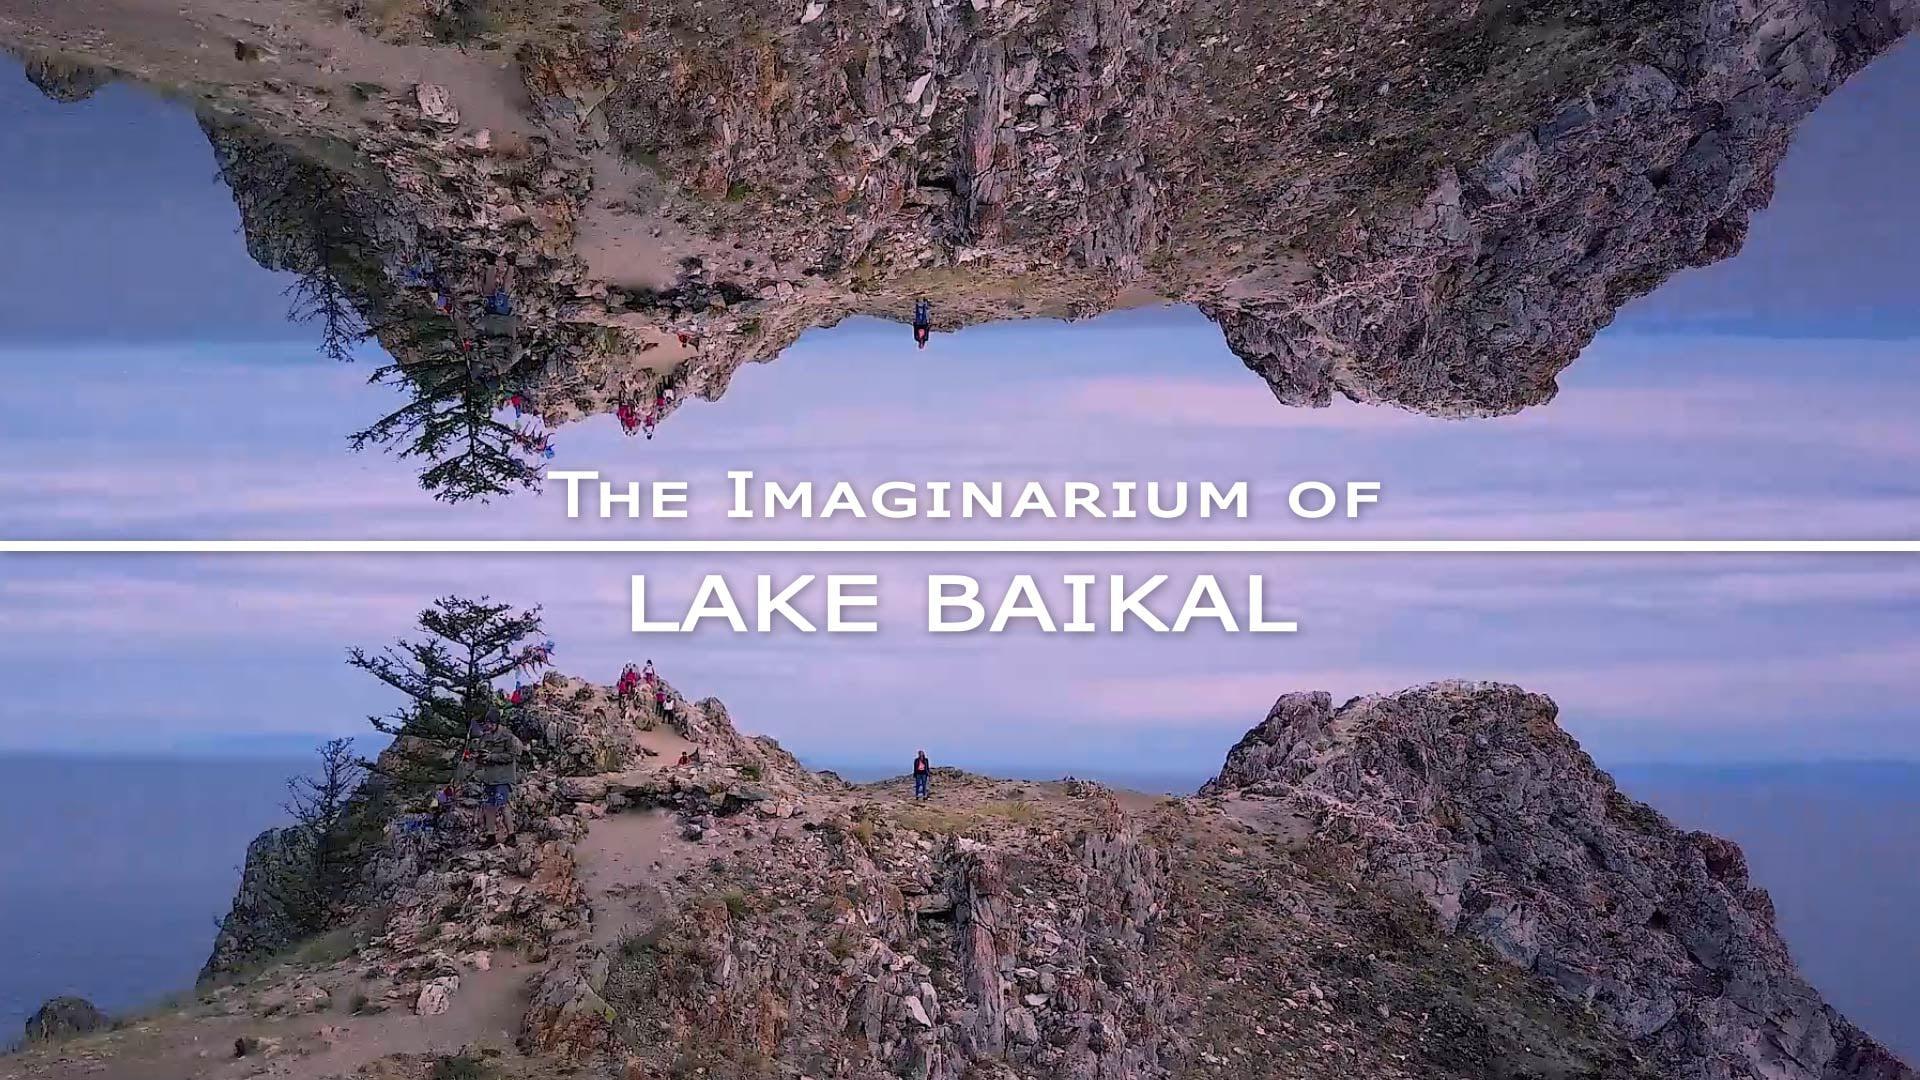 Воображариум озера Байкал